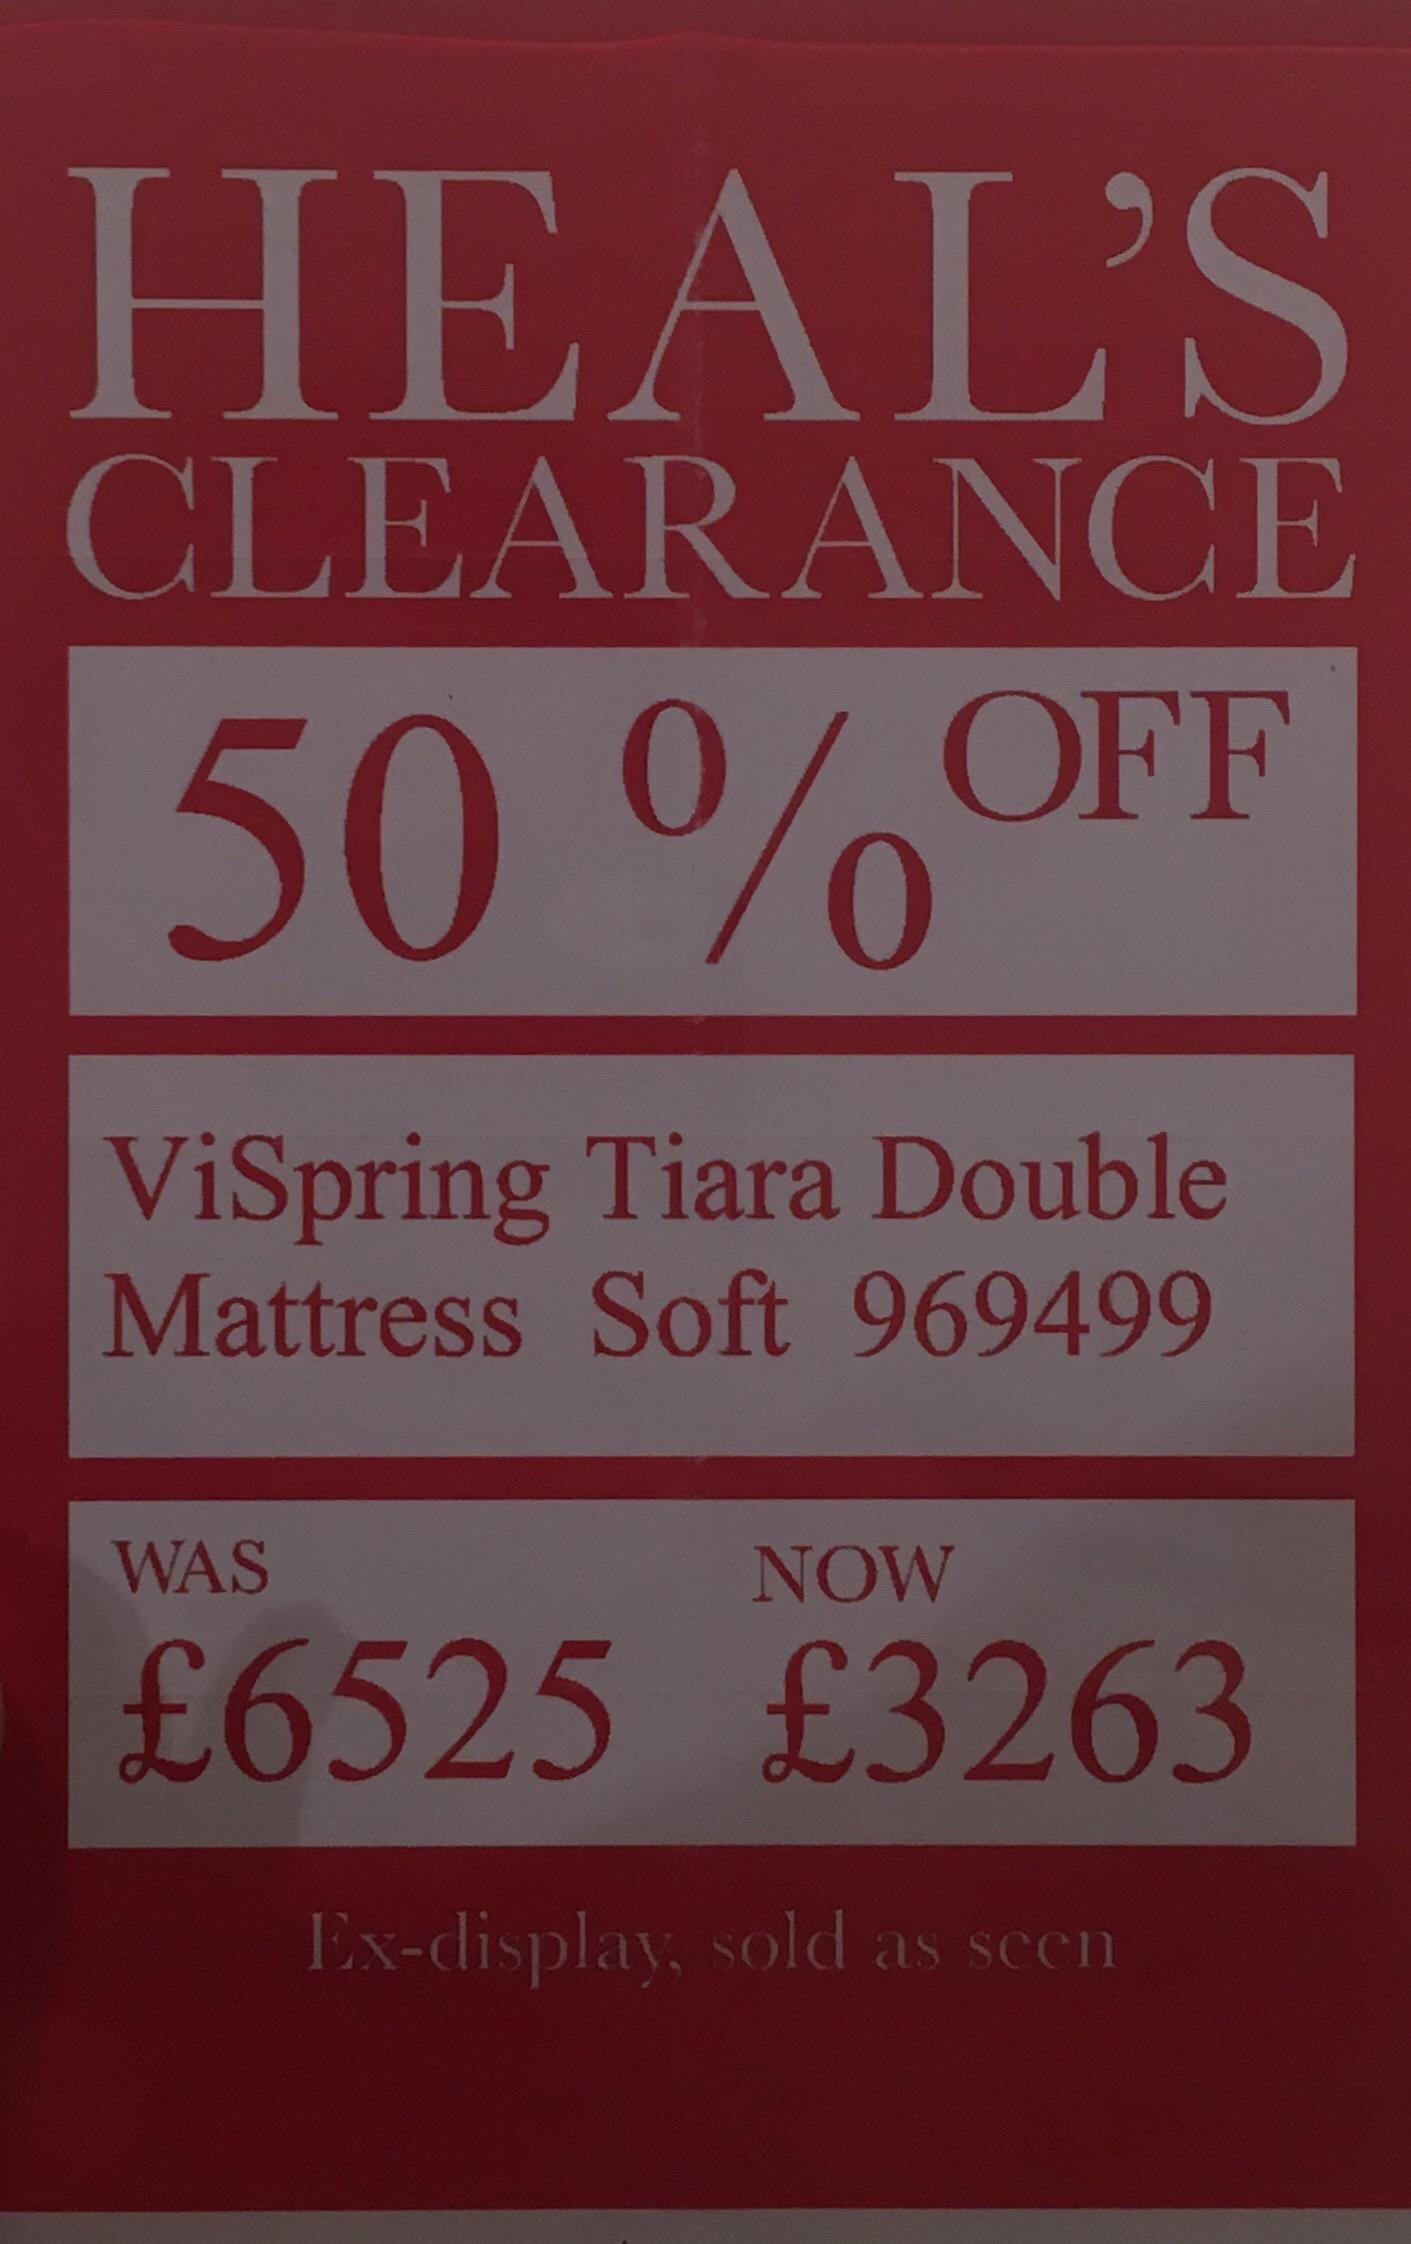 50% Off Vi-Spring Tiara Double Mattress ex display Soft - Heal's Kingston store